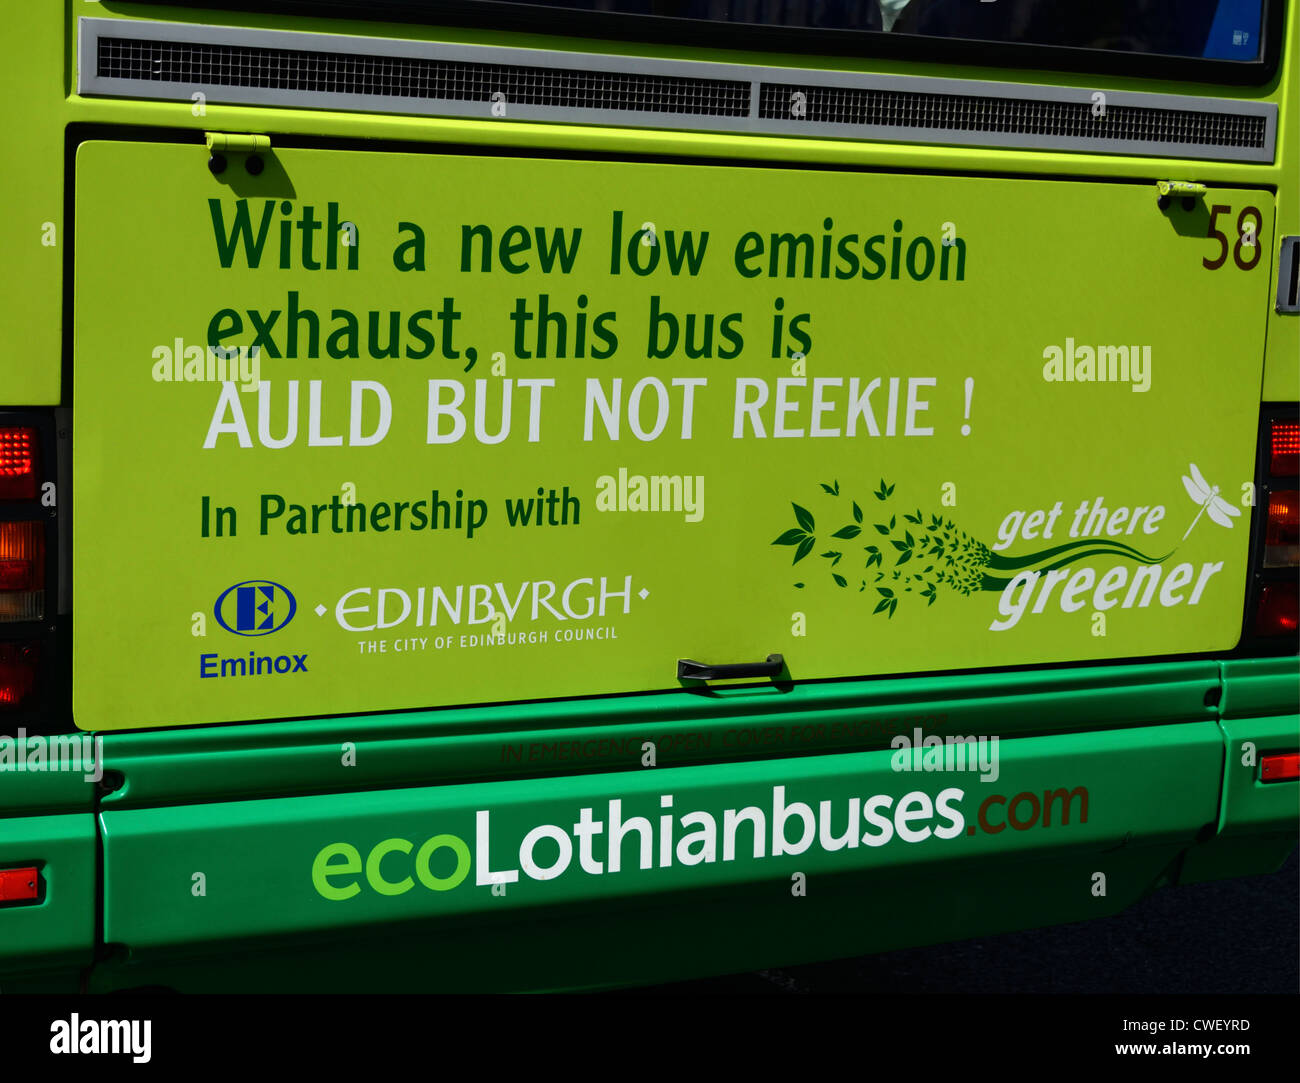 auld-but-not-reekie-!-slogan-on-edinburgh-bus-CWEYRD.jpg